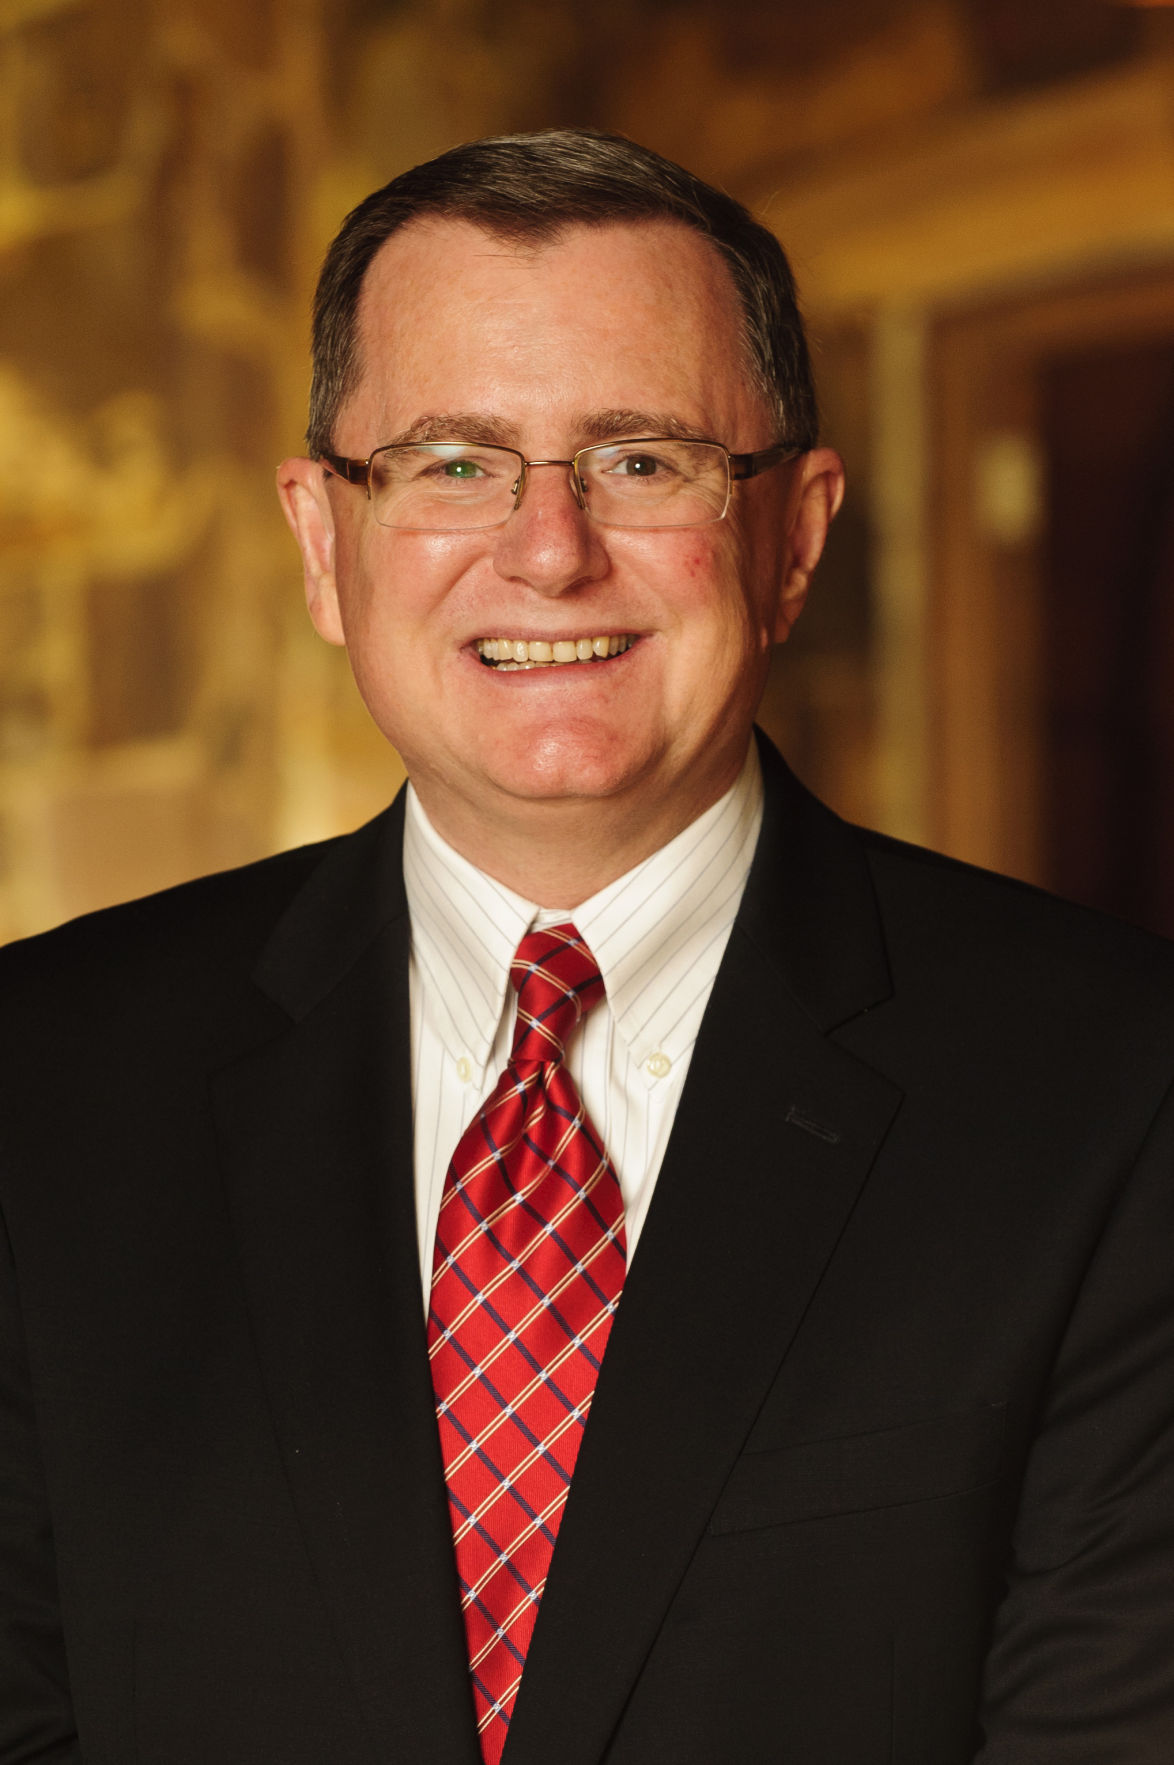 Alexander Whitaker